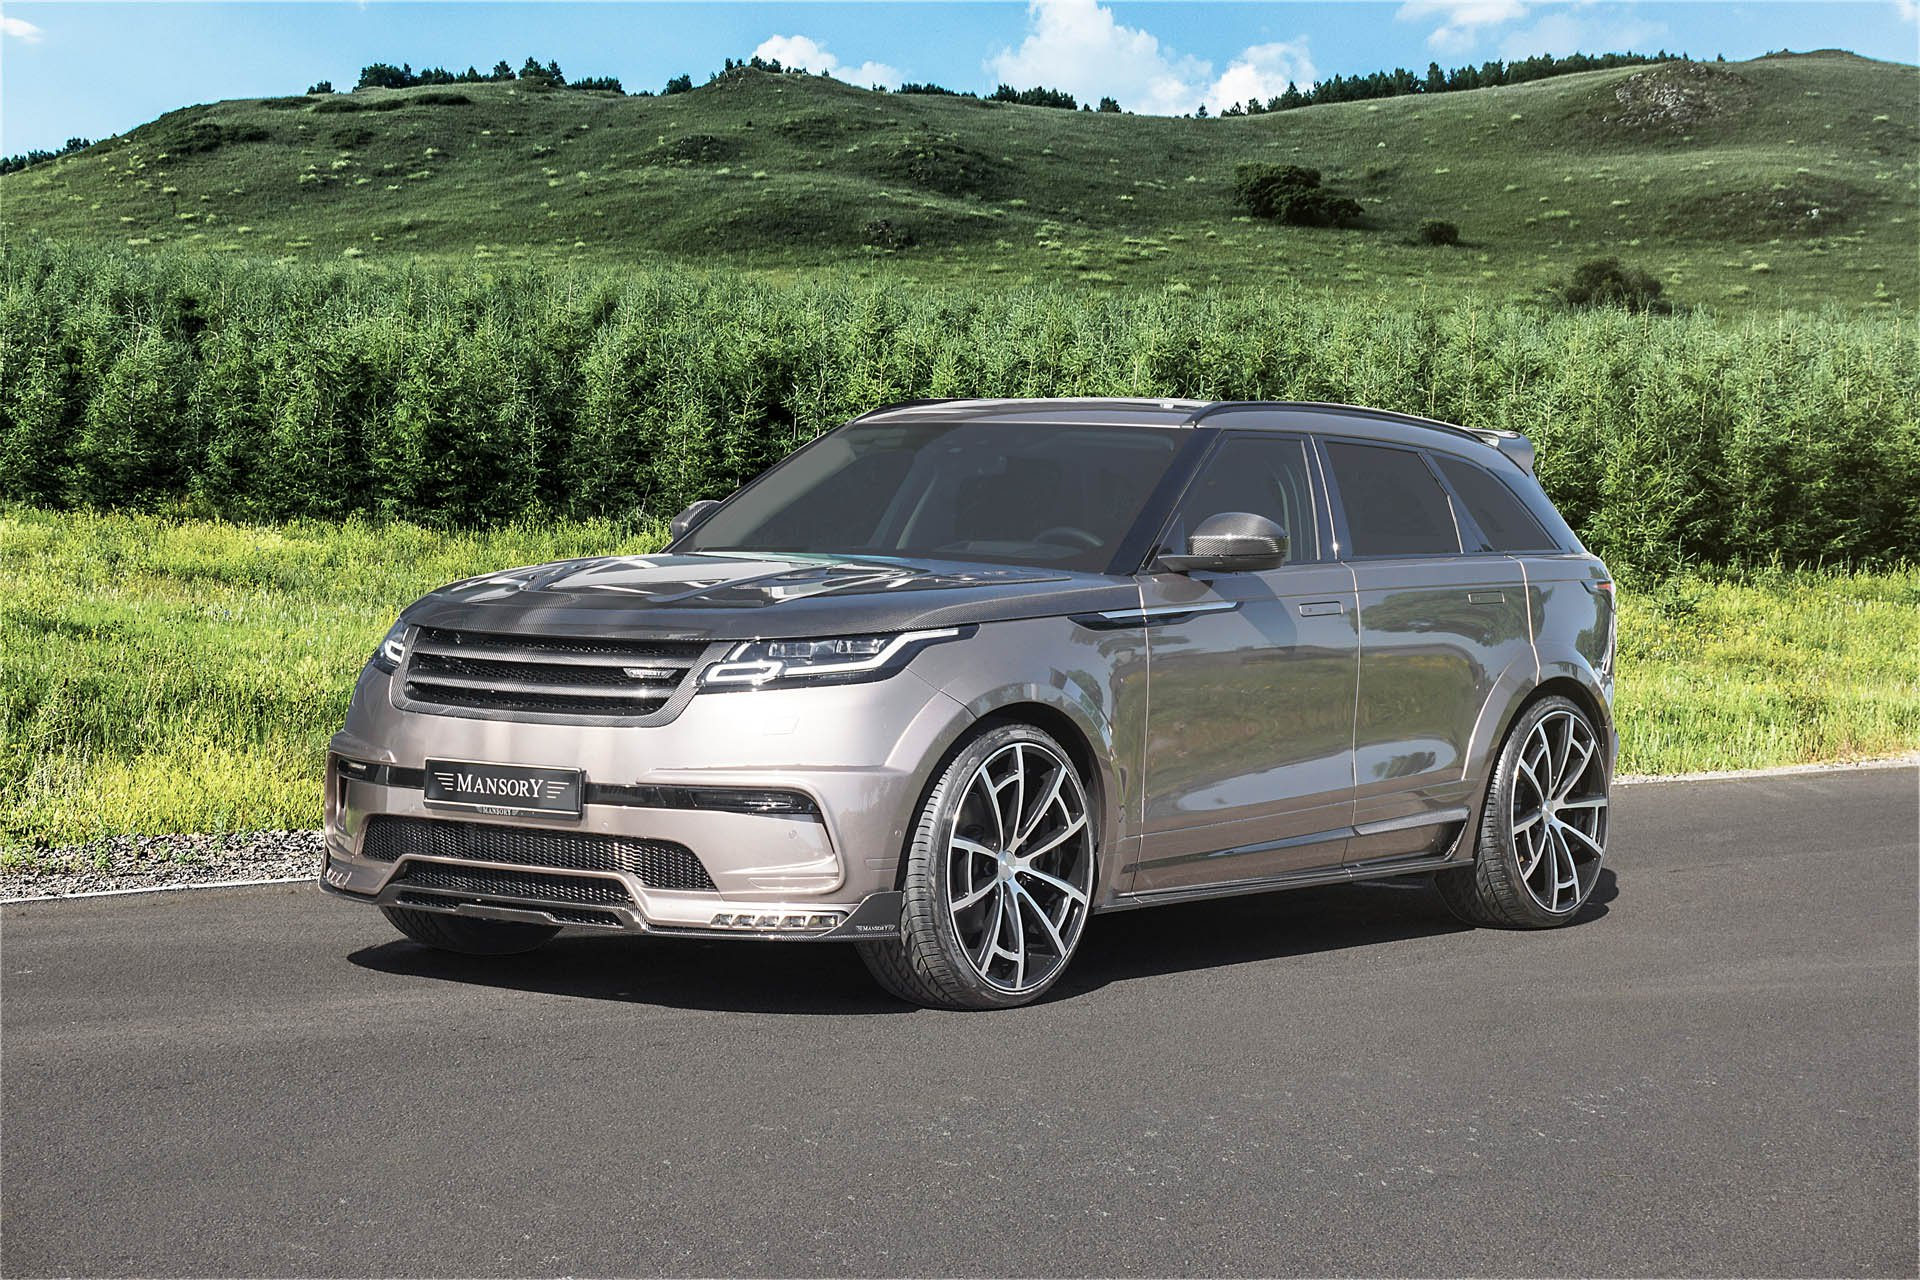 Range Rover Velar by Mansory (1)